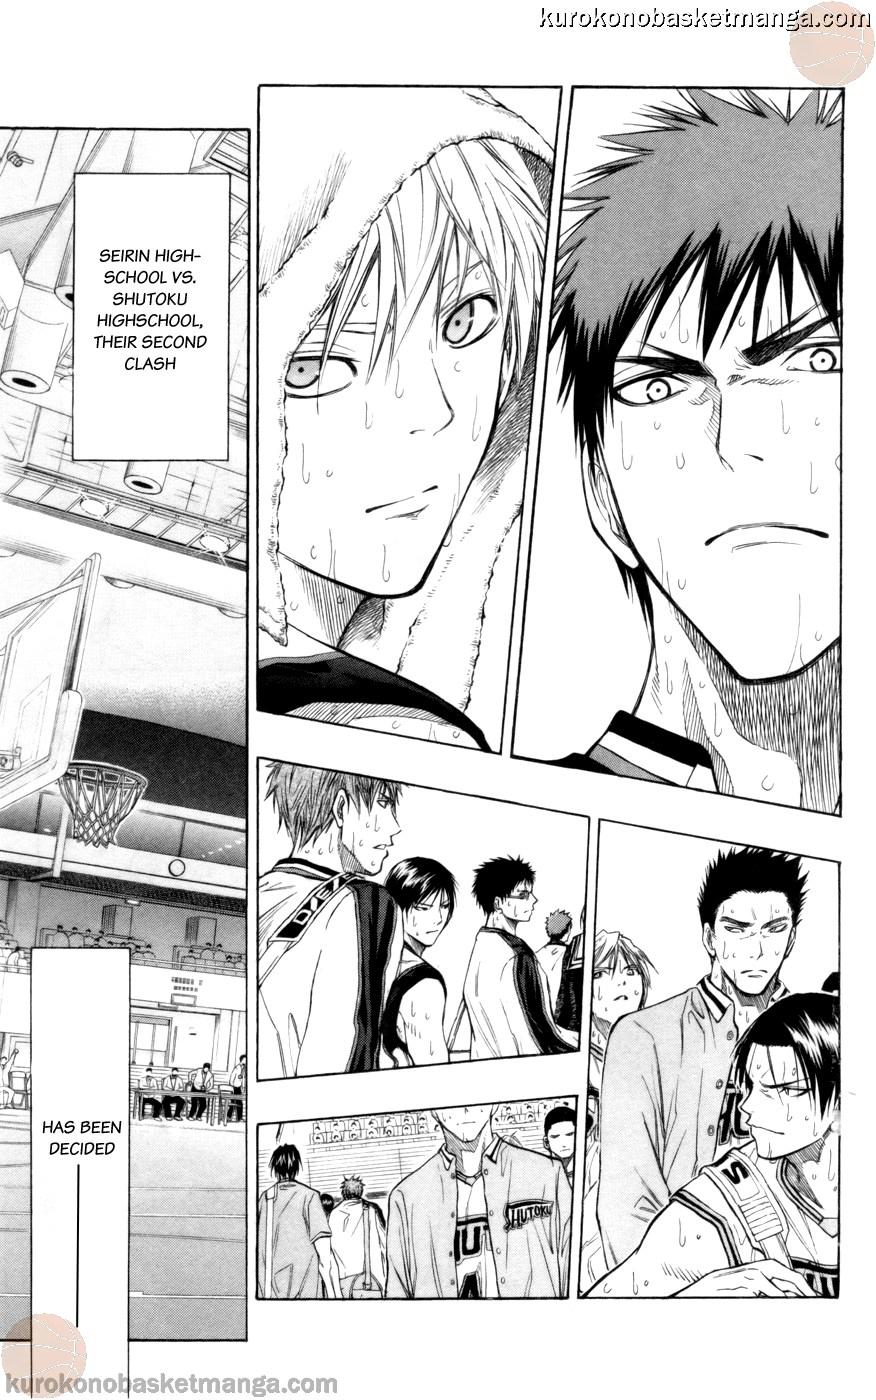 Kuroko no Basket Manga Chapter 85 - Image 05